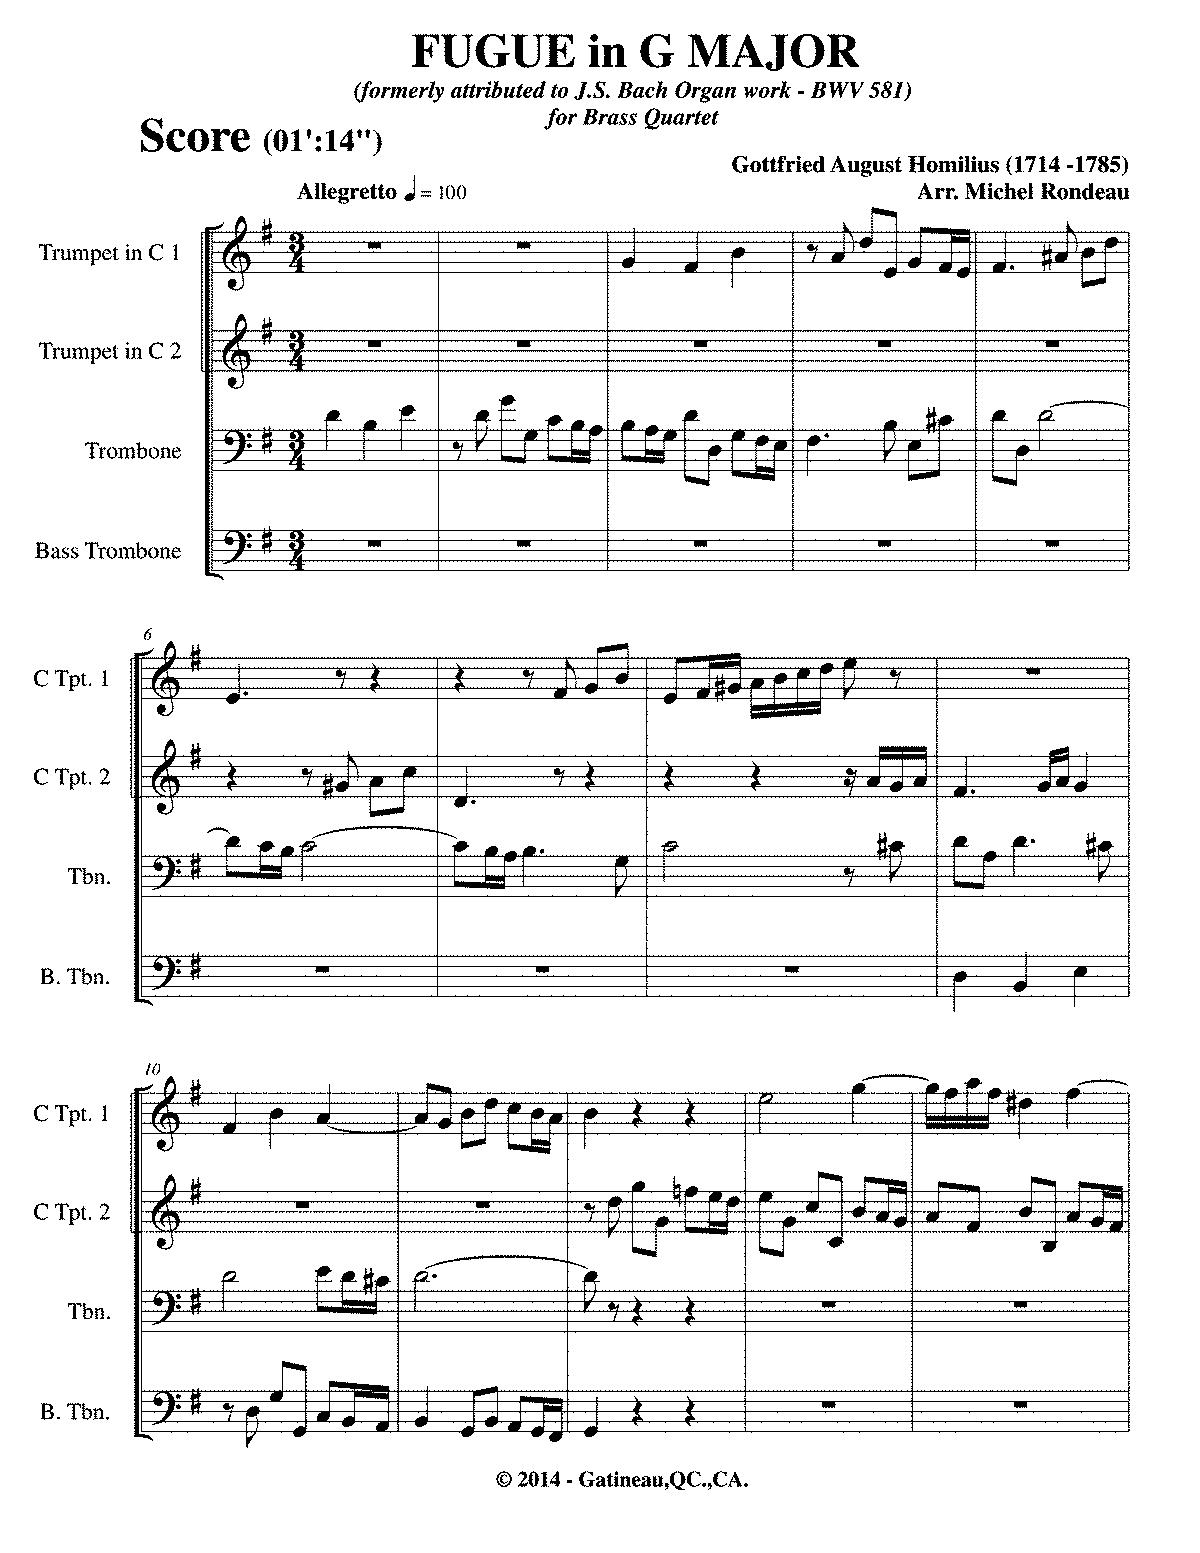 fugue in g major homilius gottfried august imslp petrucci music